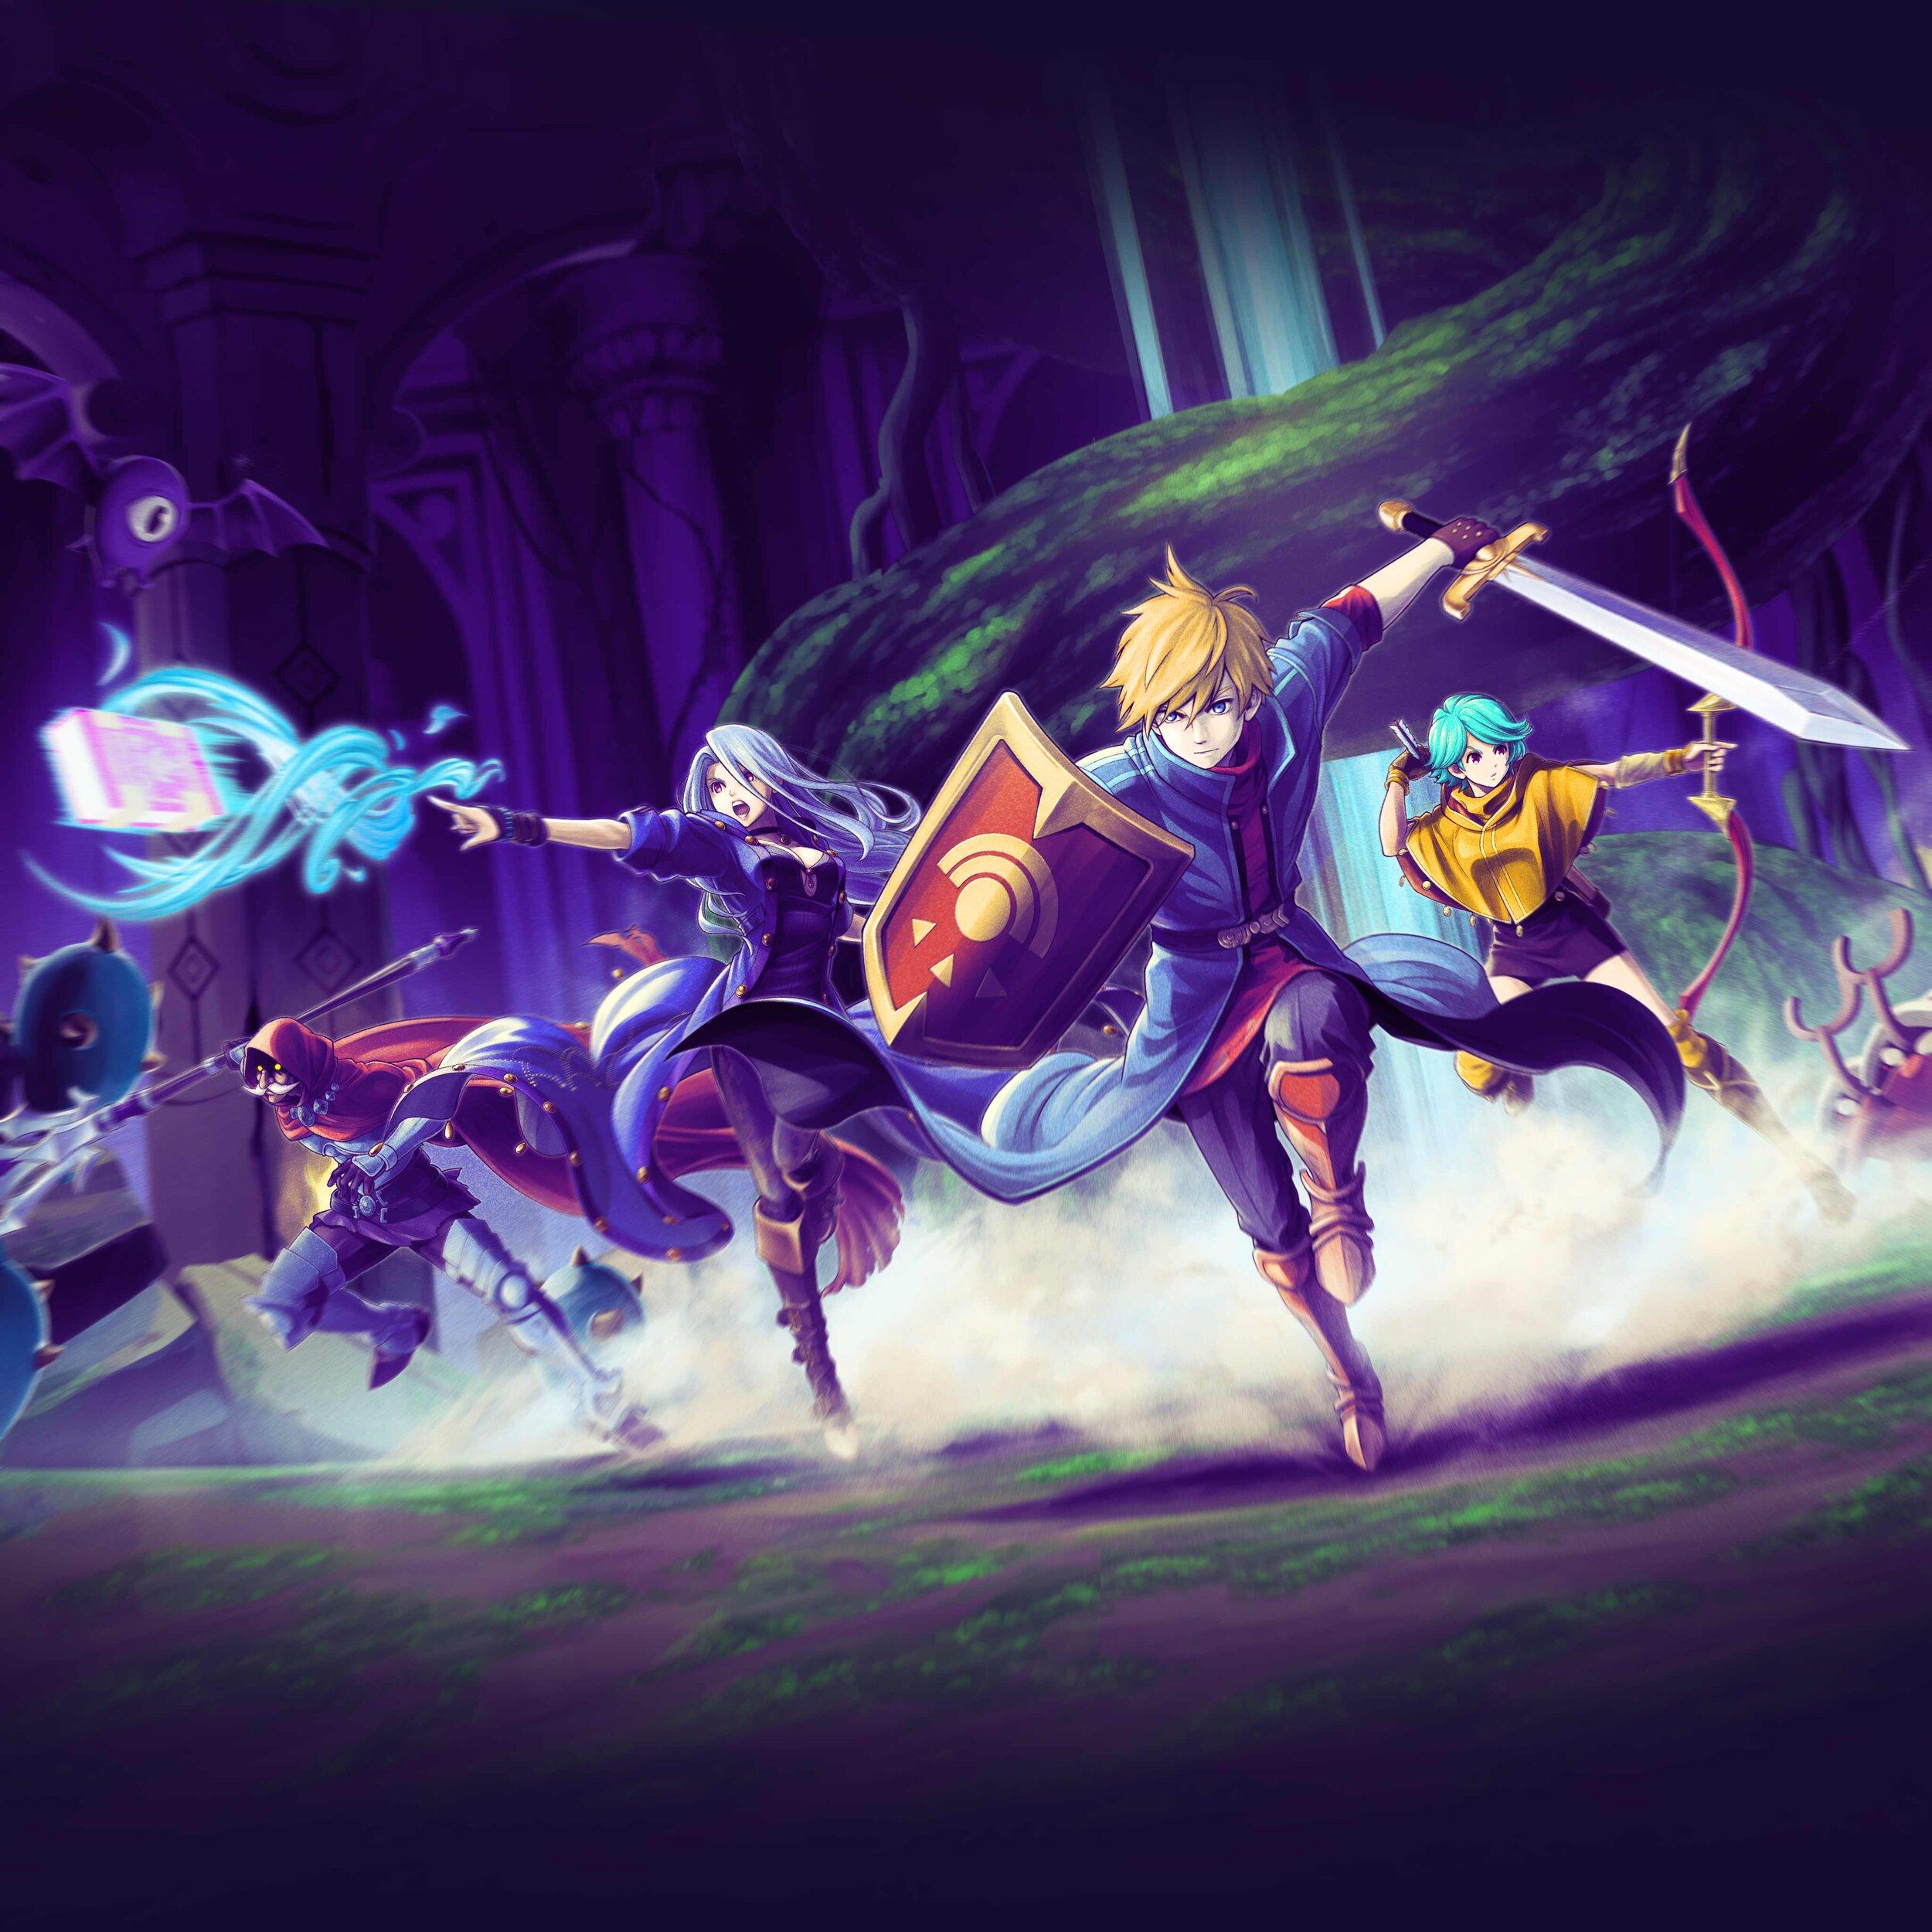 'Oceanhorn: Chronos Dungeon' is now available on Apple Arcade